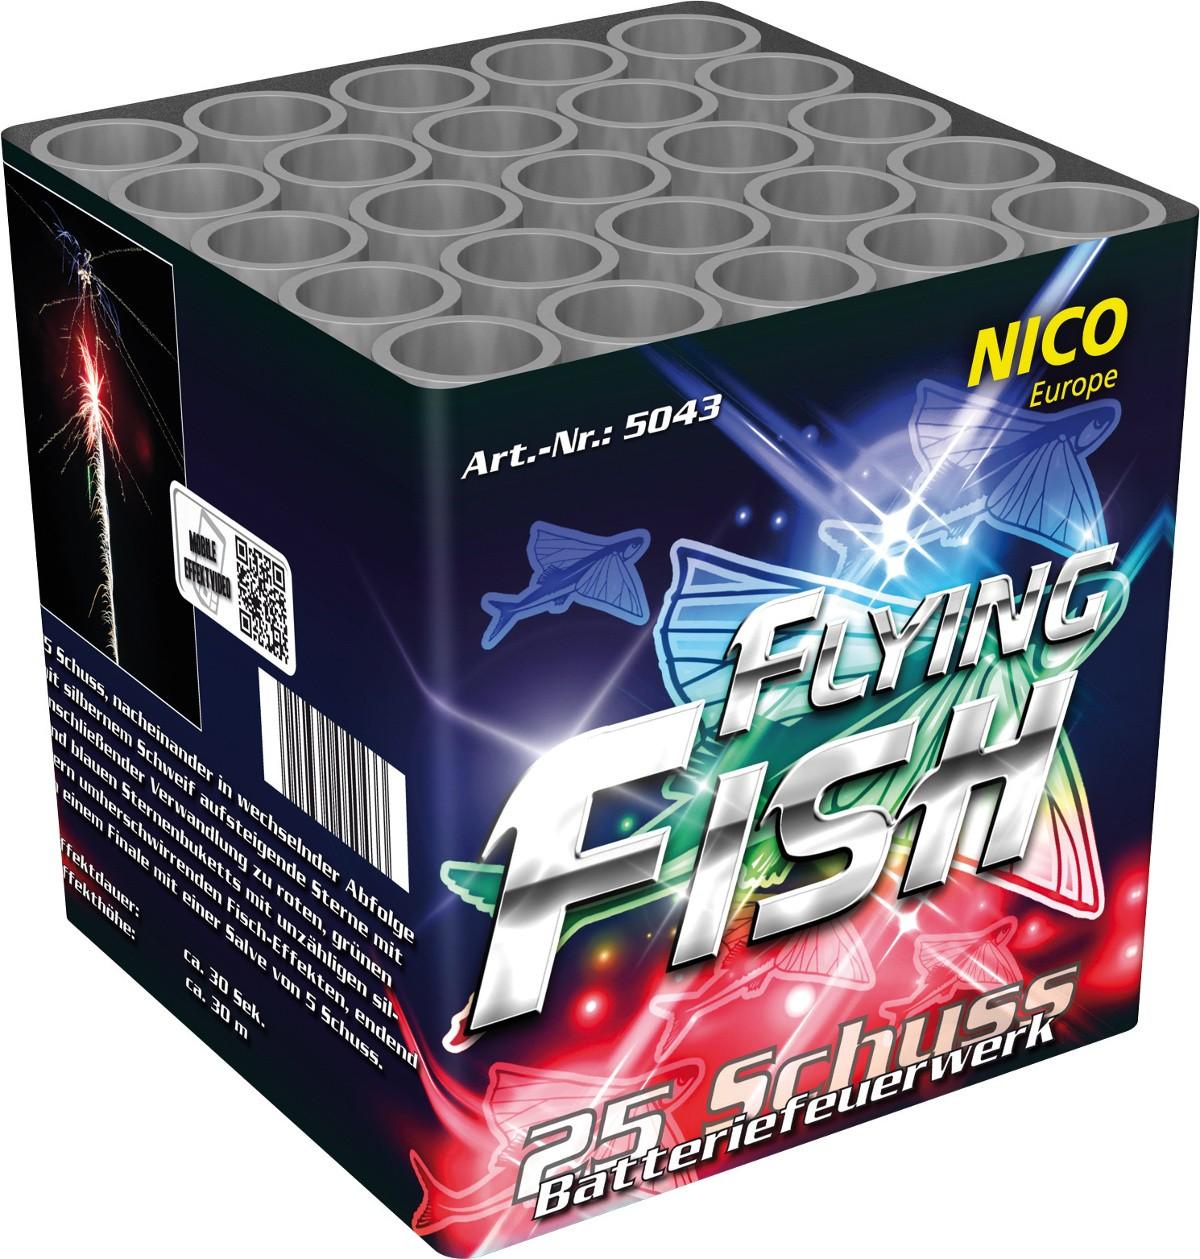 Flying Fish Batterie 25 Schuss